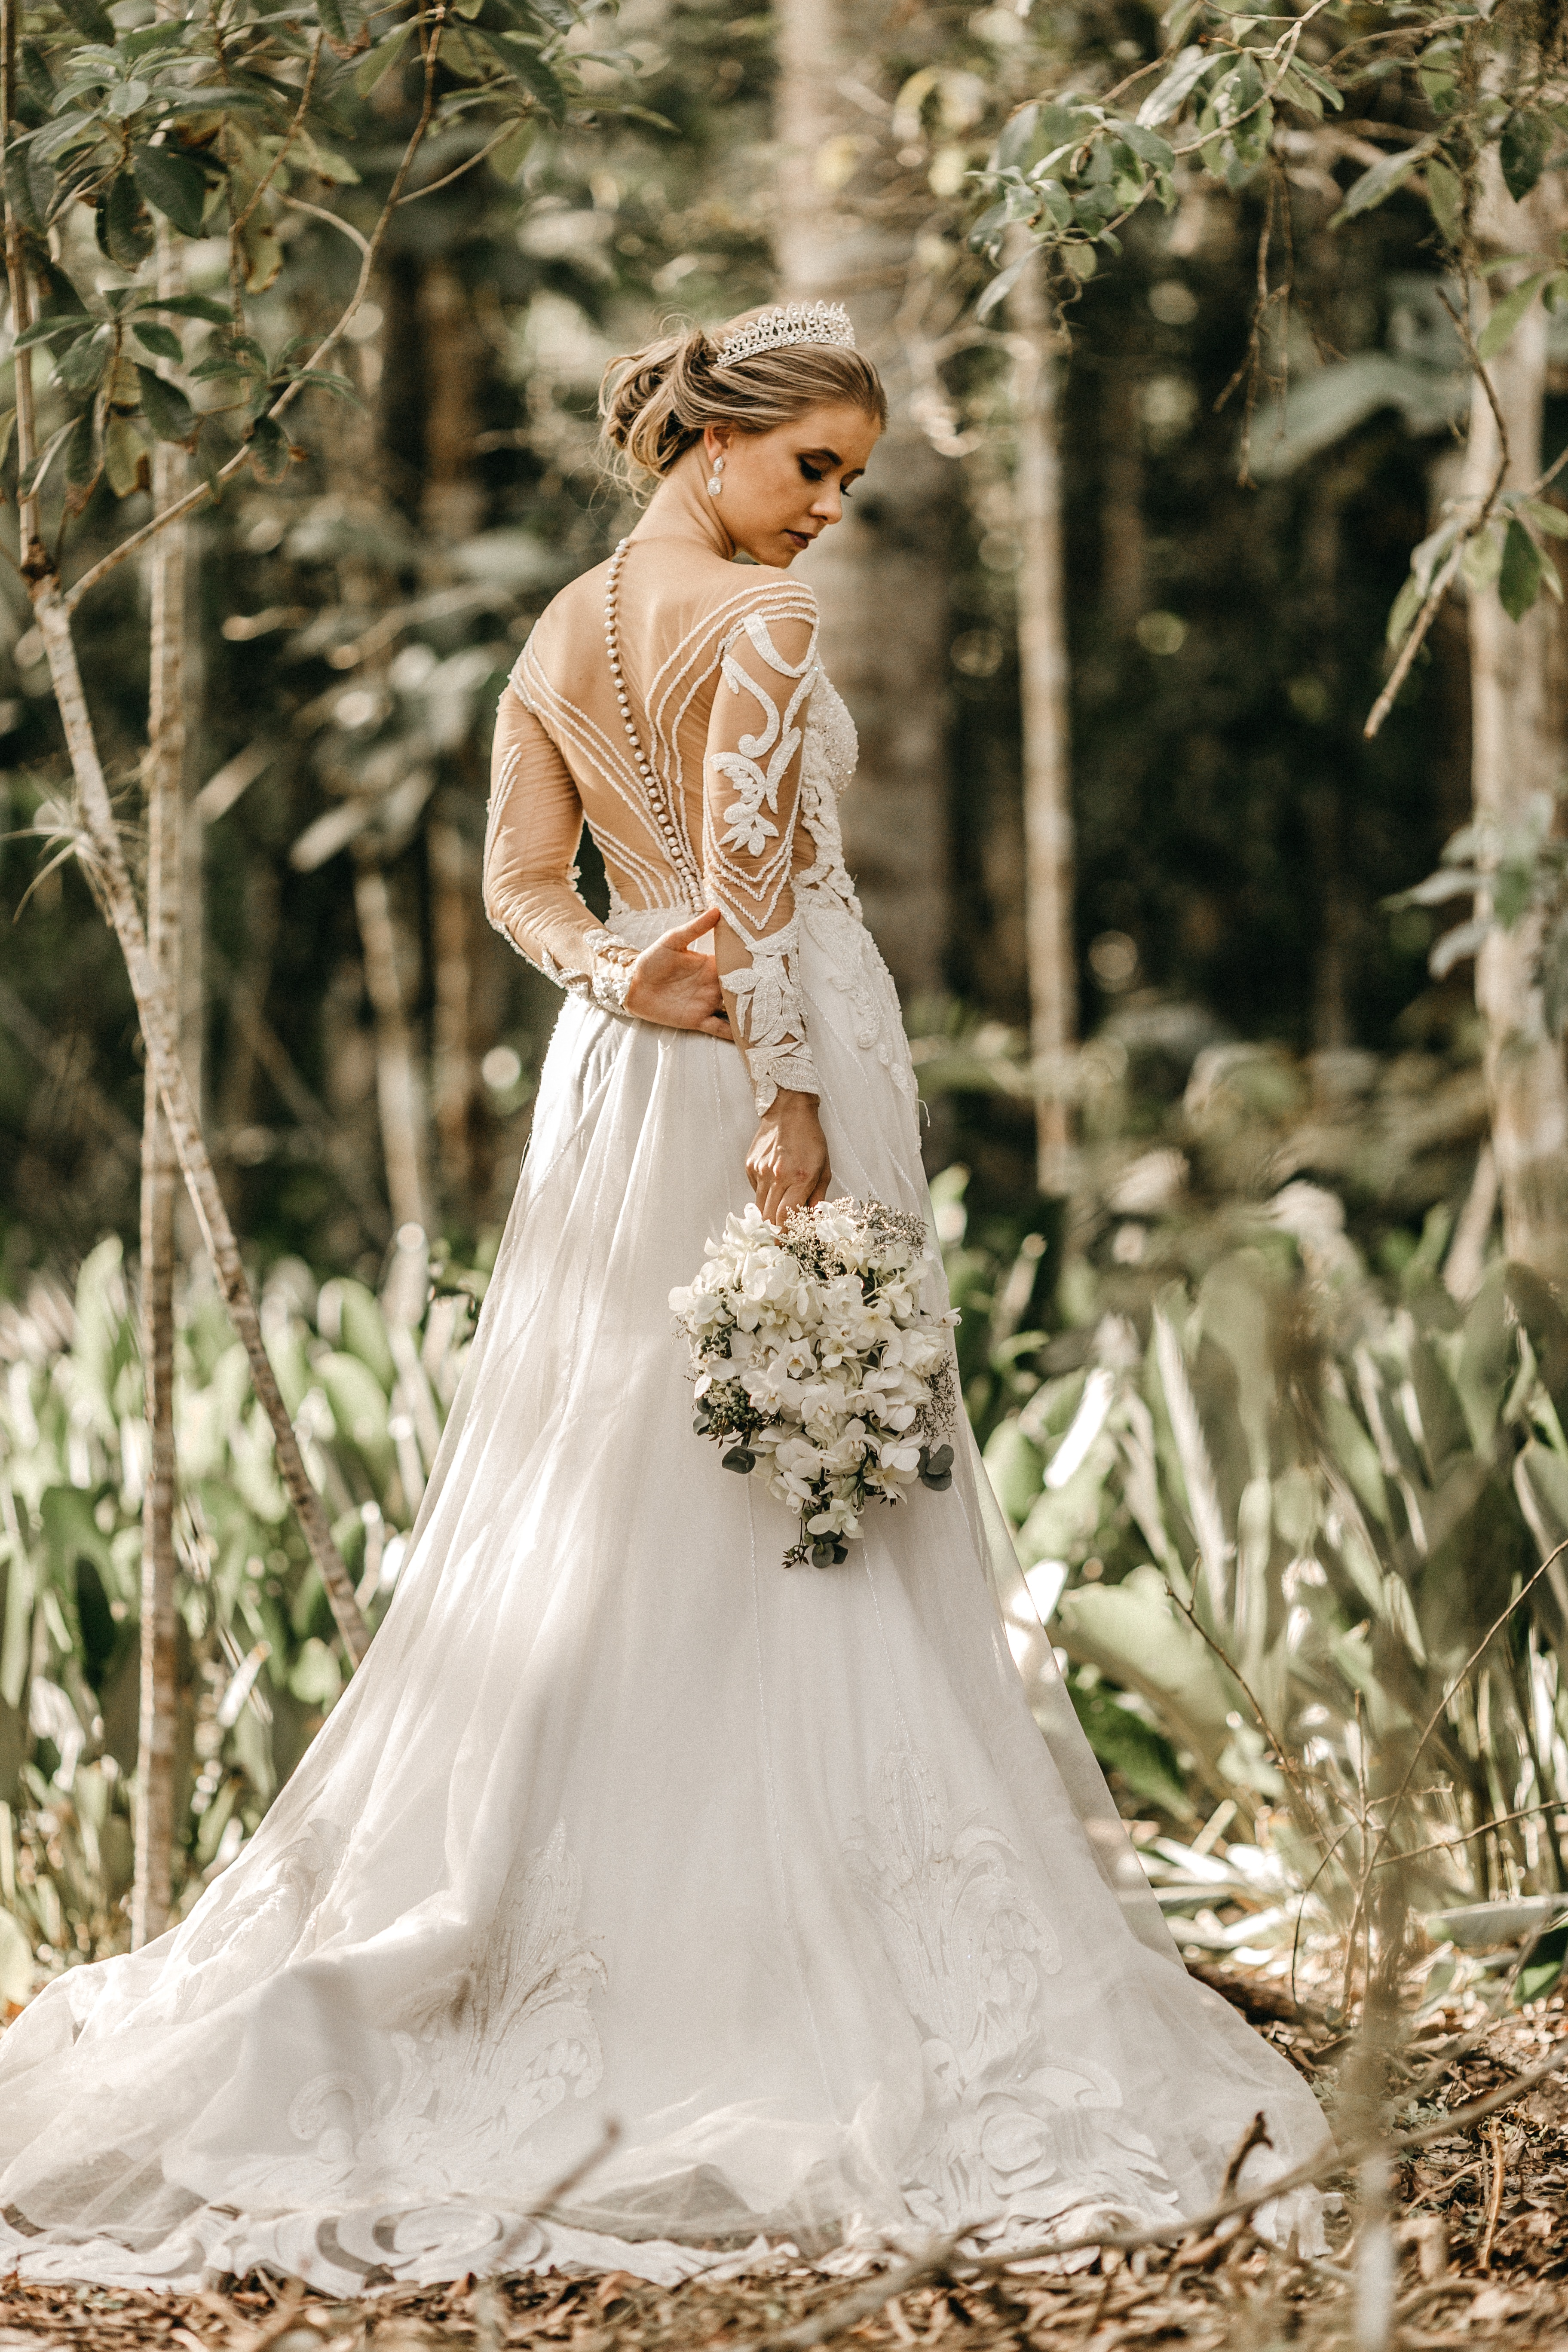 Choosing Your Wedding Dress Fabric